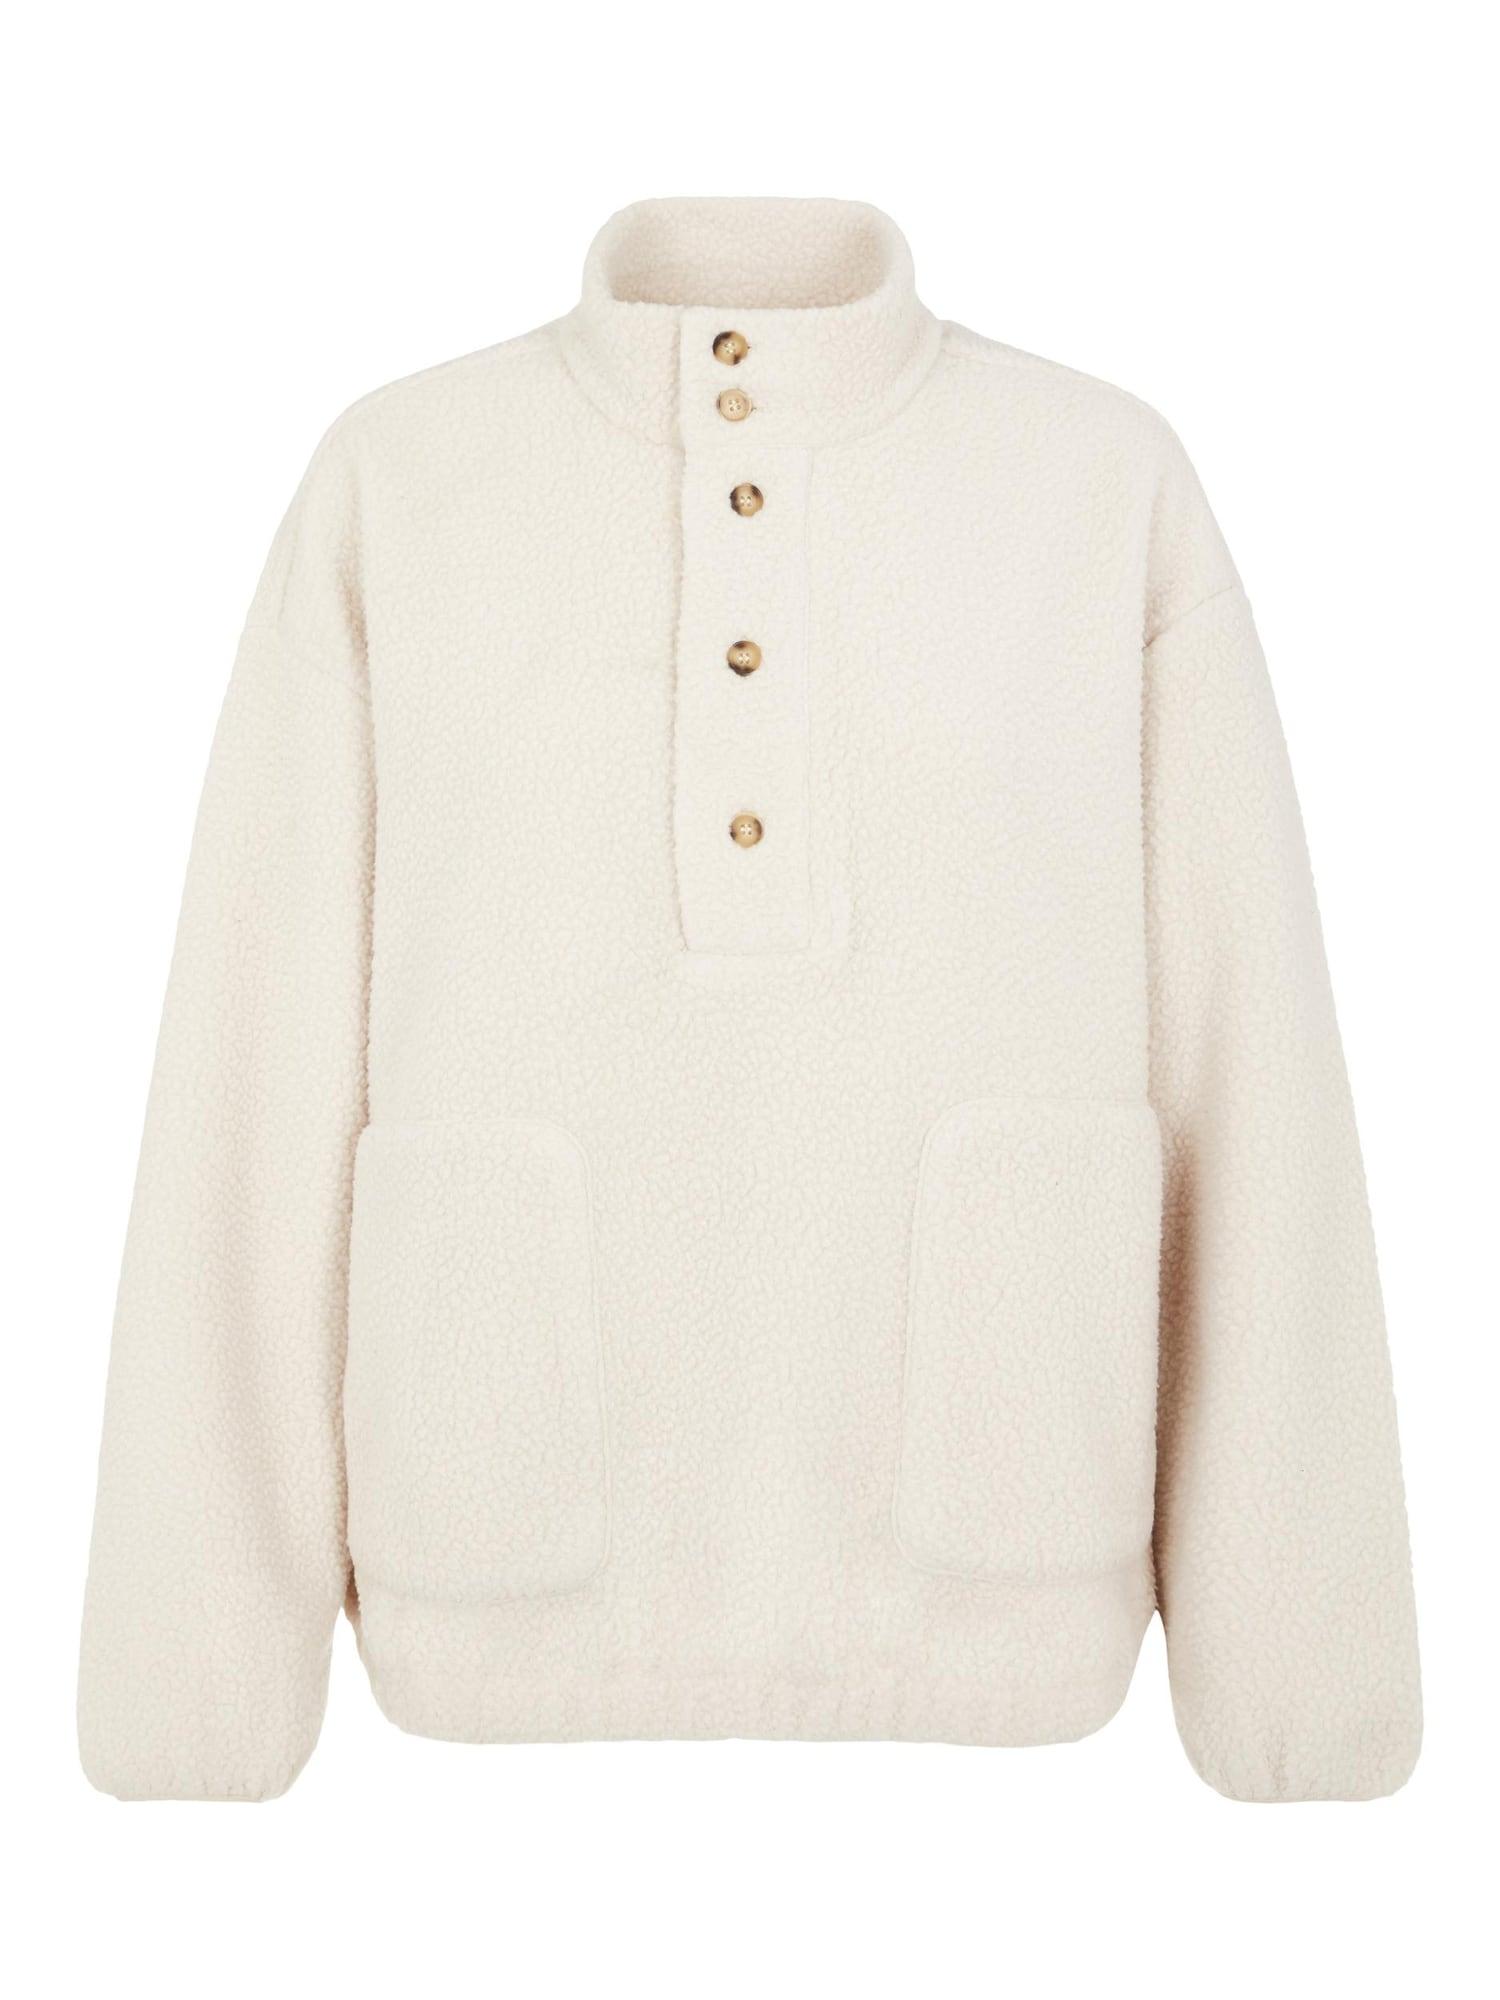 OBJECT Megztinis natūrali balta